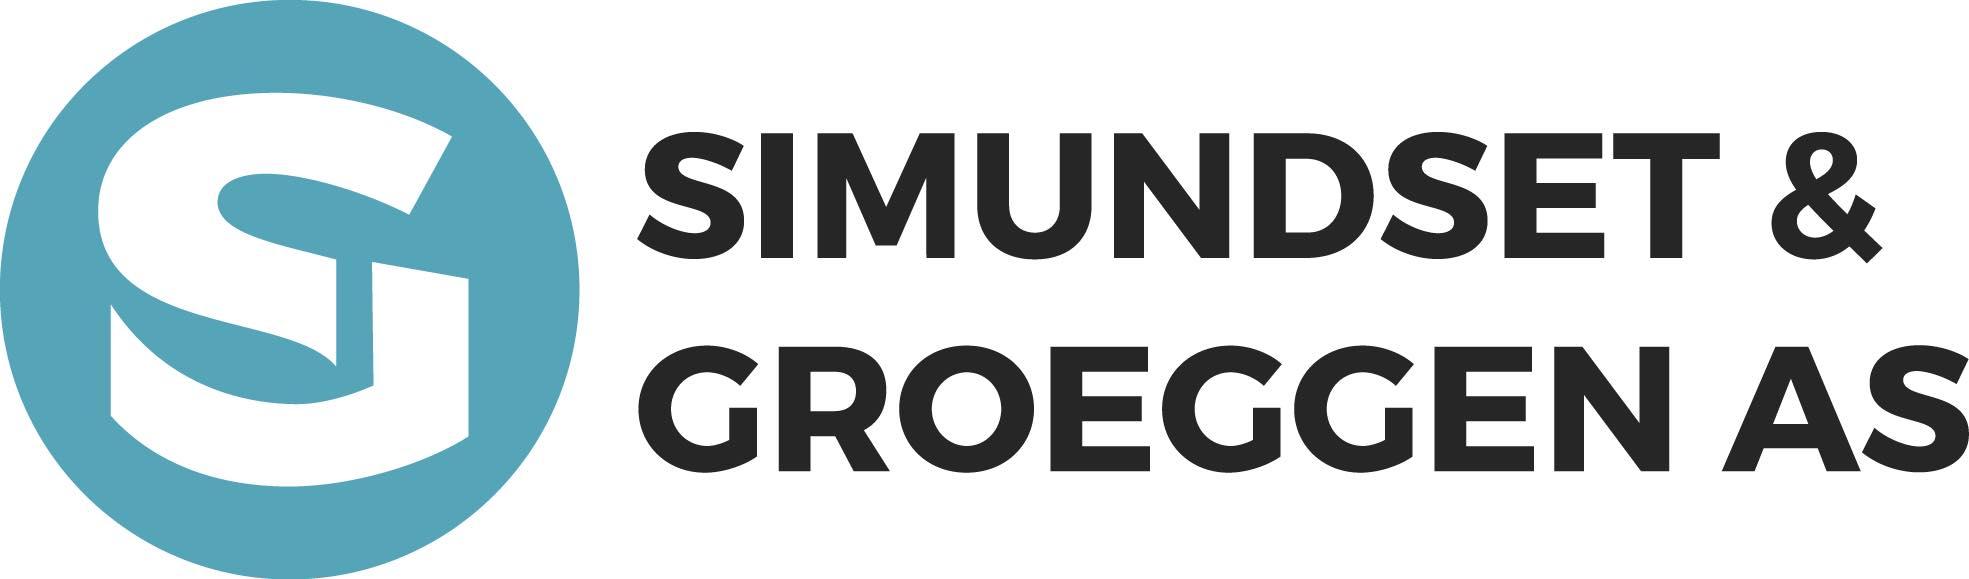 Arne Simundseth